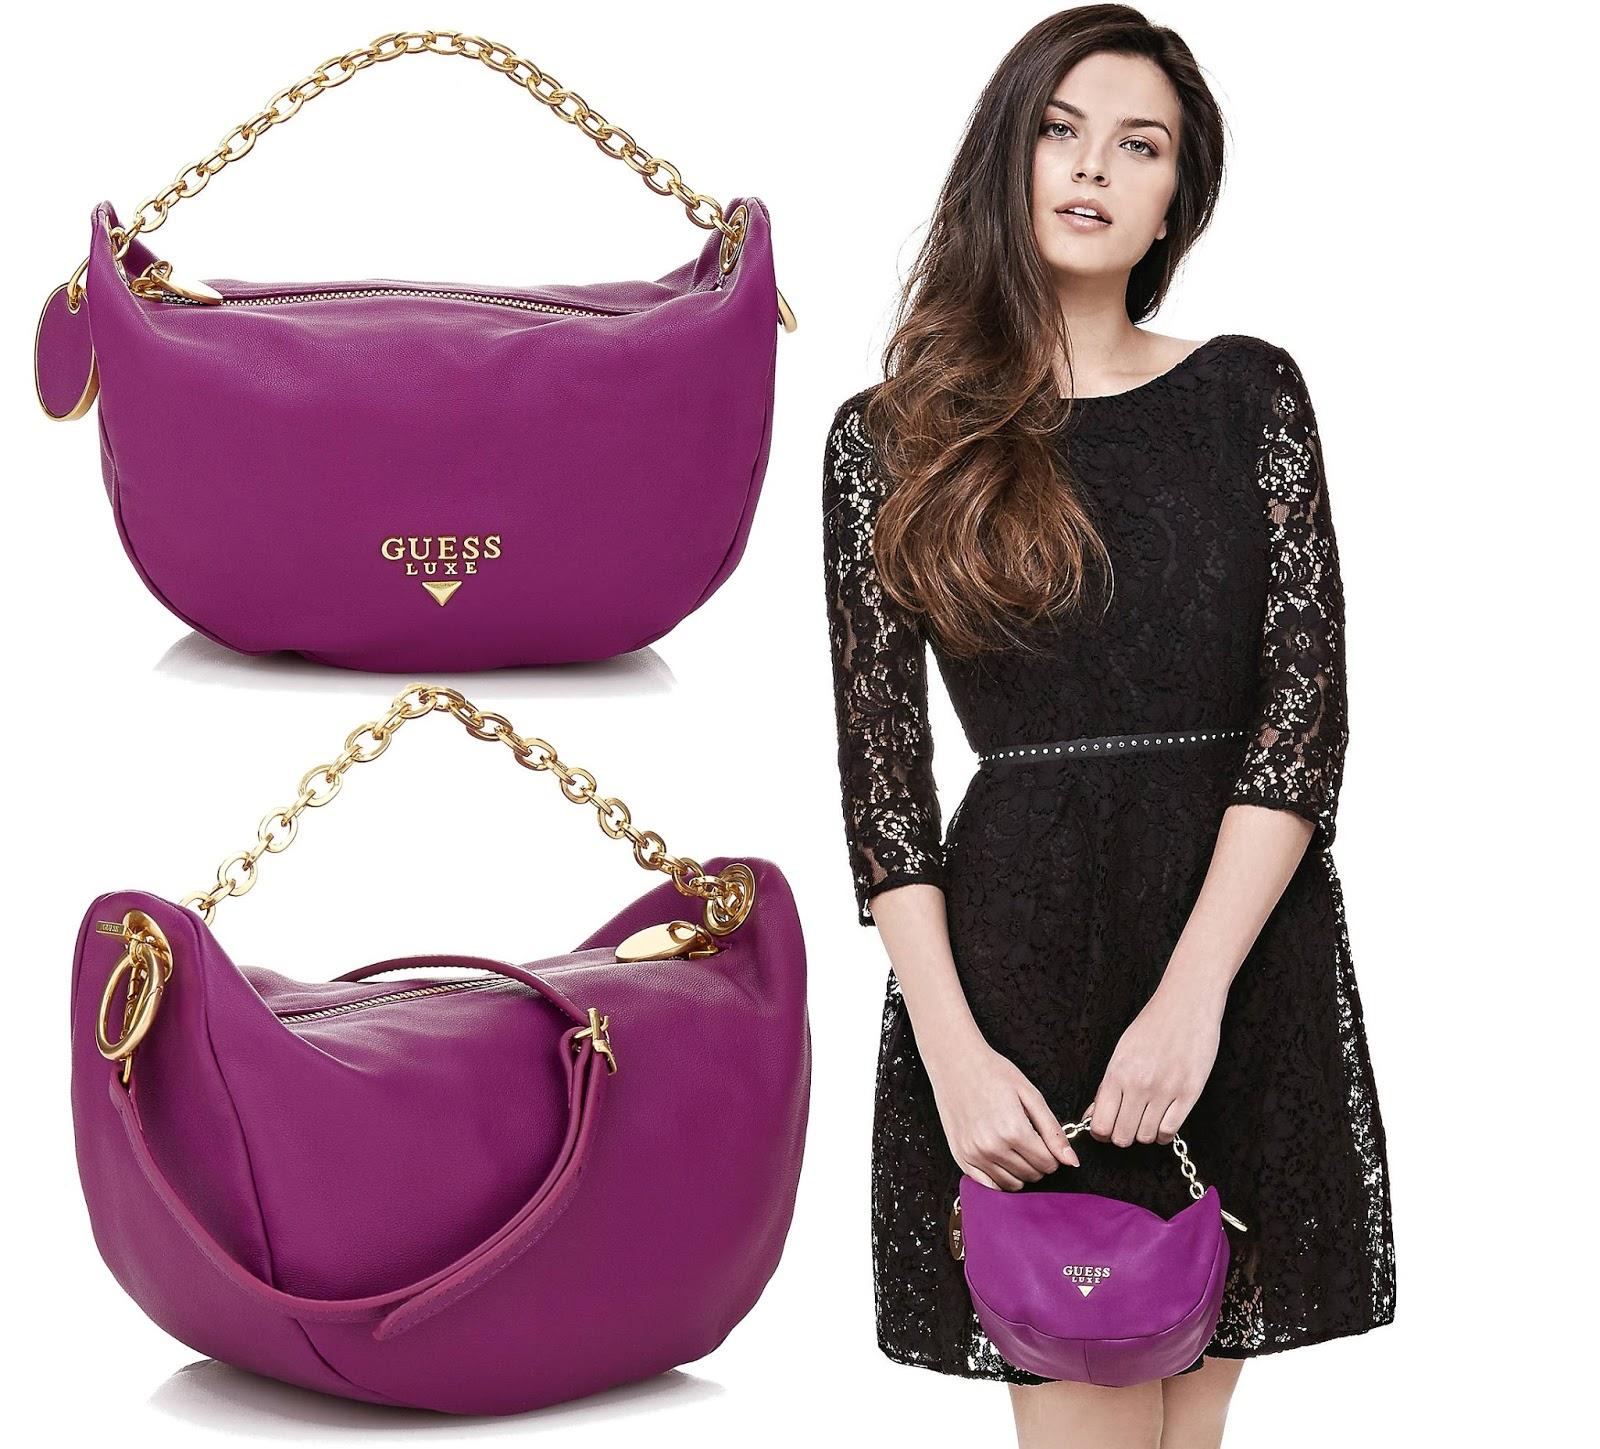 borsa-guess-ultra-violet